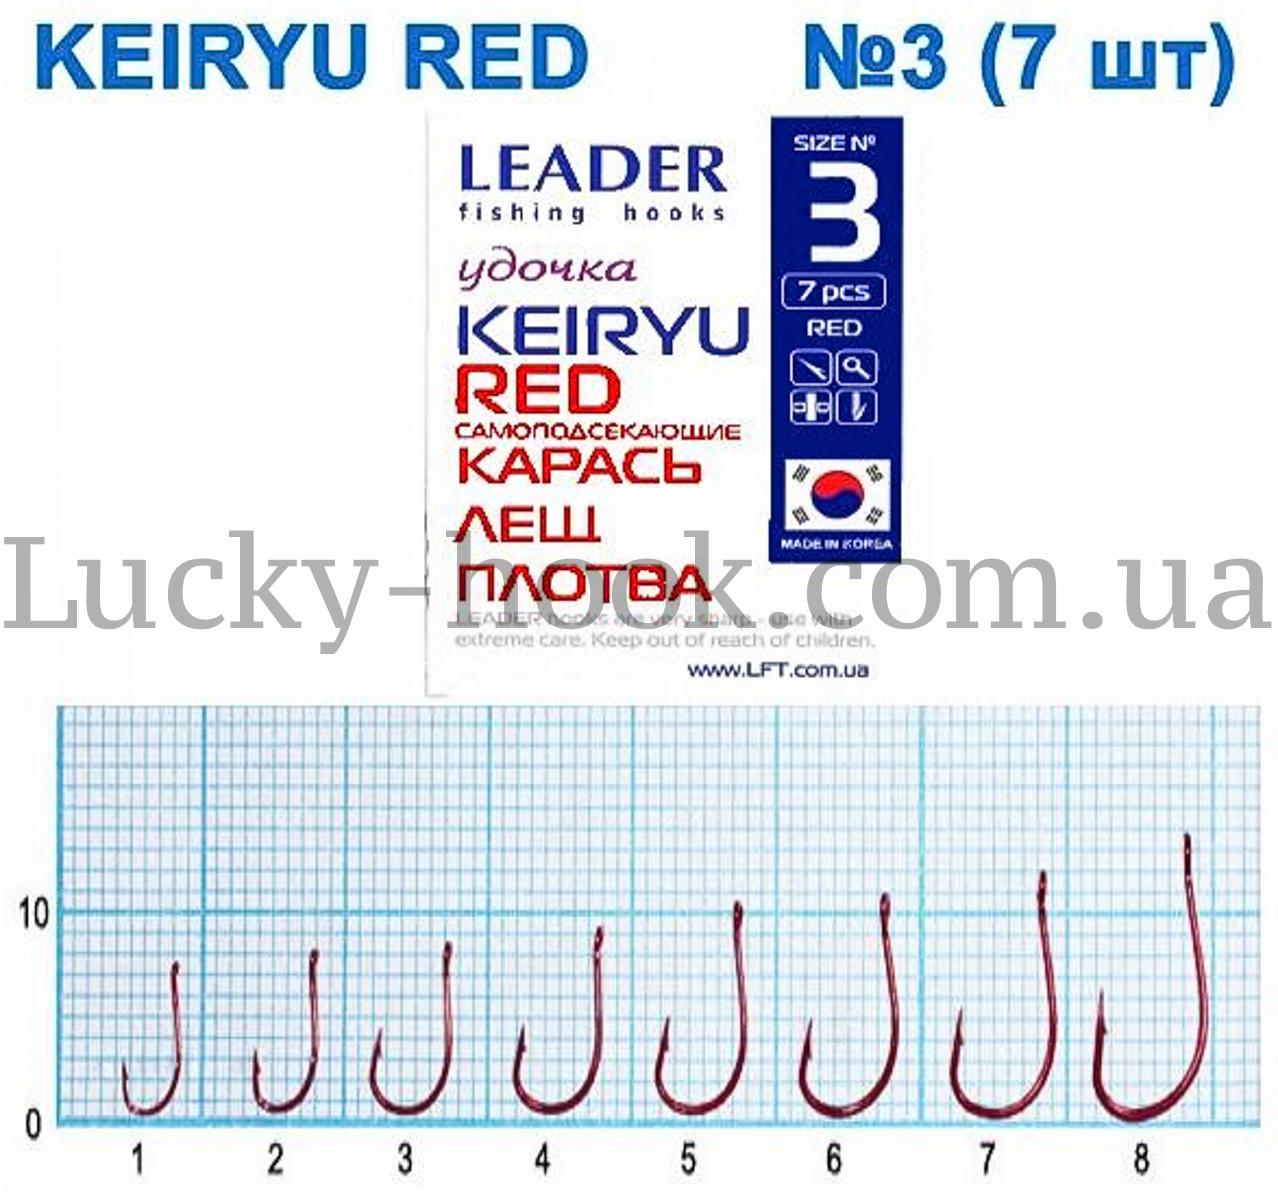 Крючок Leader Keiryu red самоподсекающие (карась, лещ, плотва) №3